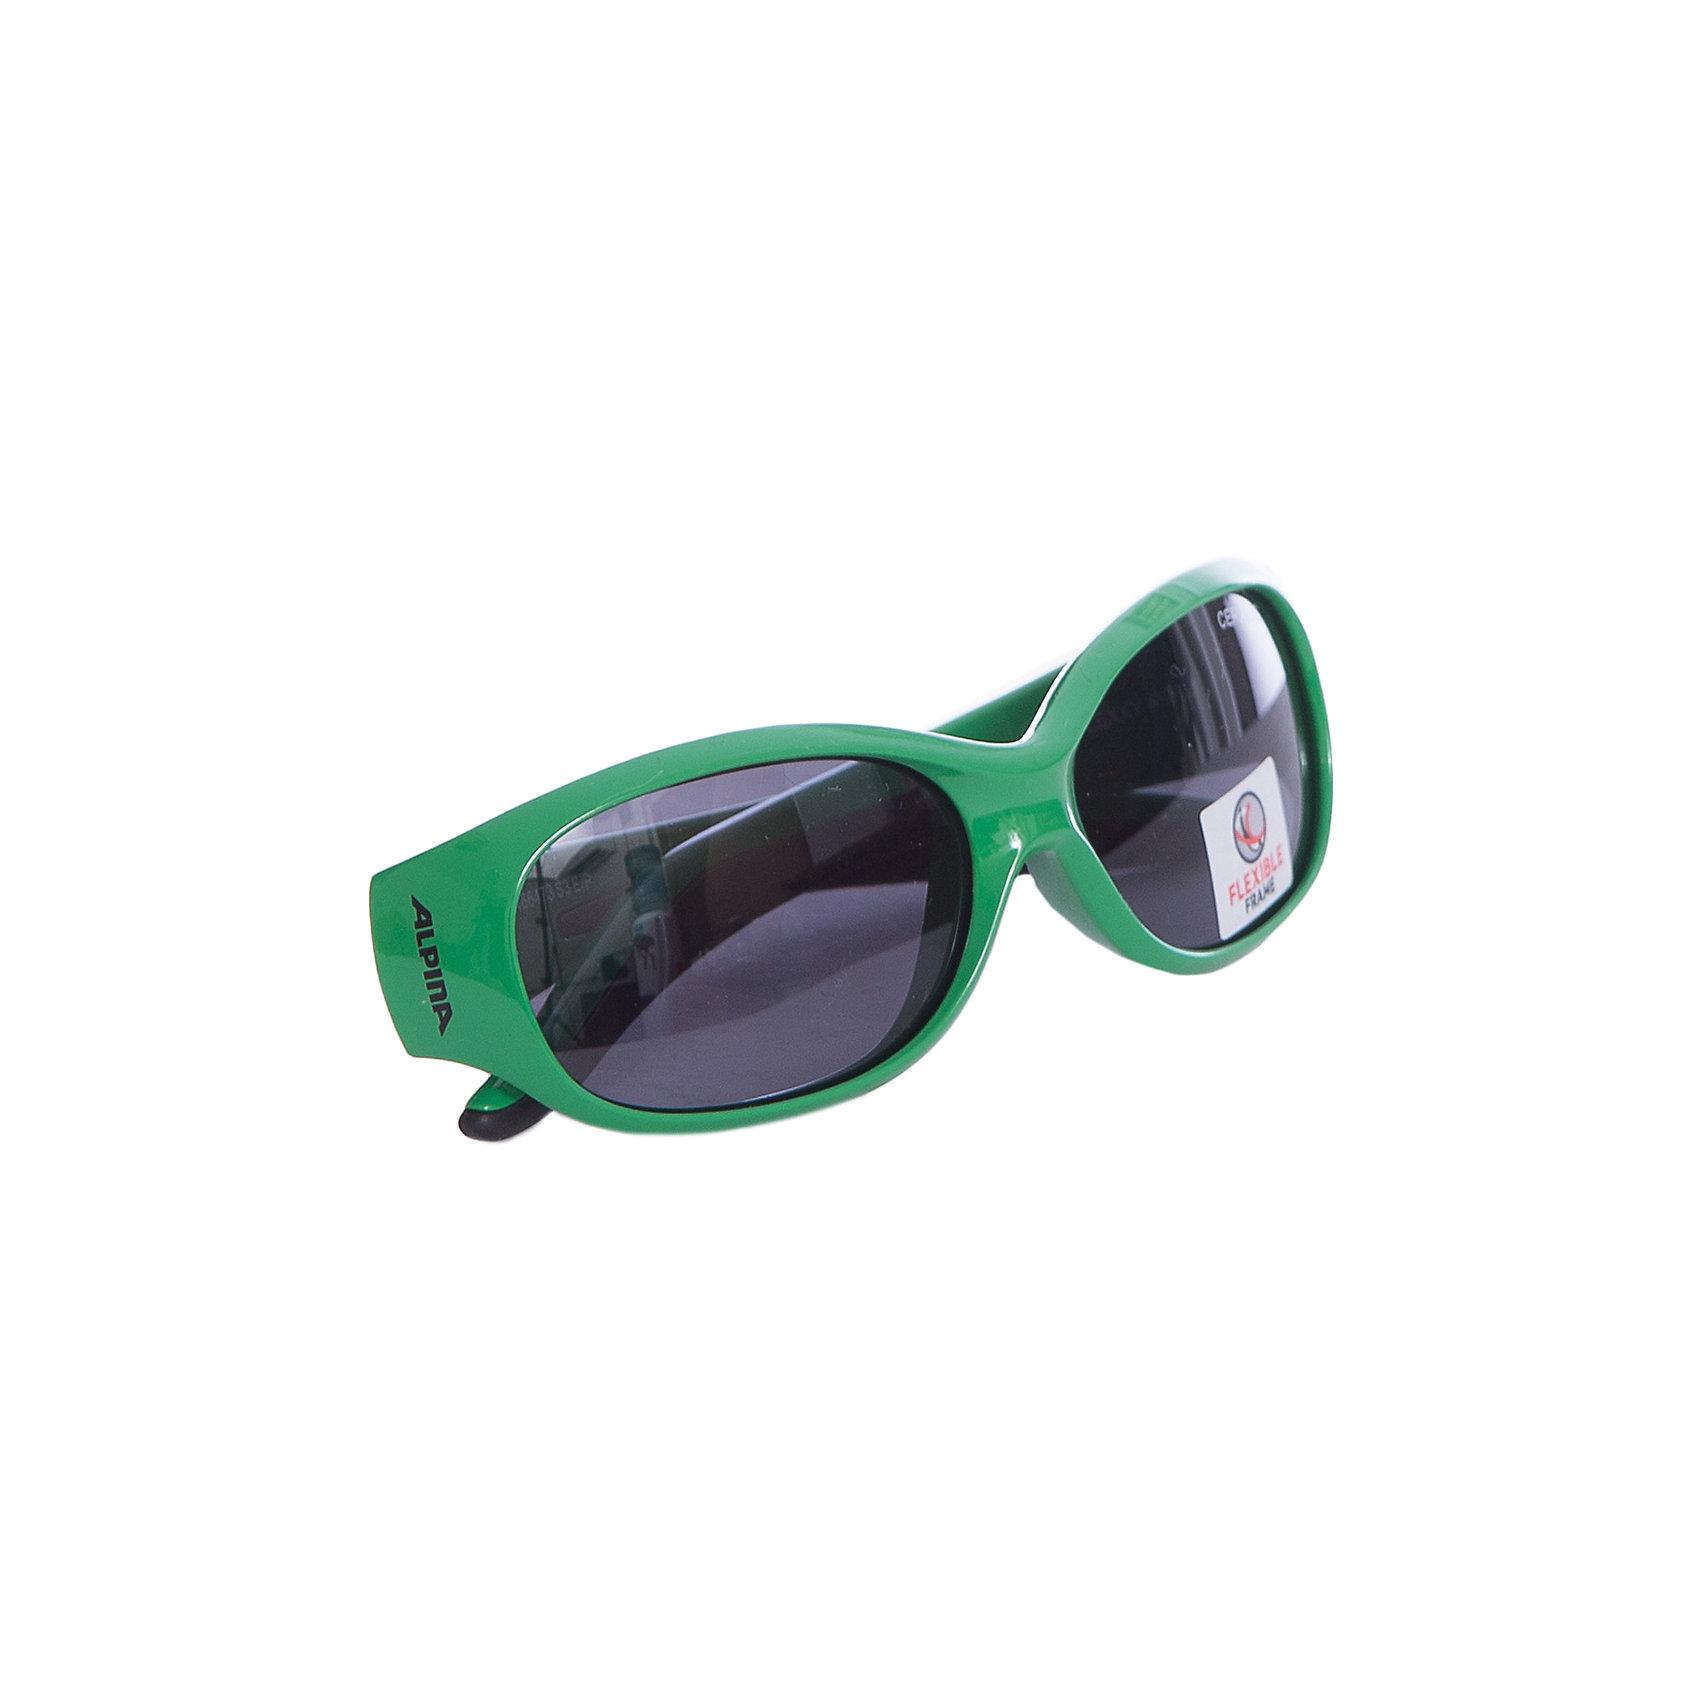 Очки солнцезащитные FLEXXY KIDS, ALPINAСолнцезащитные очки<br><br><br>Ширина мм: 190<br>Глубина мм: 30<br>Высота мм: 30<br>Вес г: 200<br>Возраст от месяцев: 60<br>Возраст до месяцев: 144<br>Пол: Унисекс<br>Возраст: Детский<br>SKU: 6749316